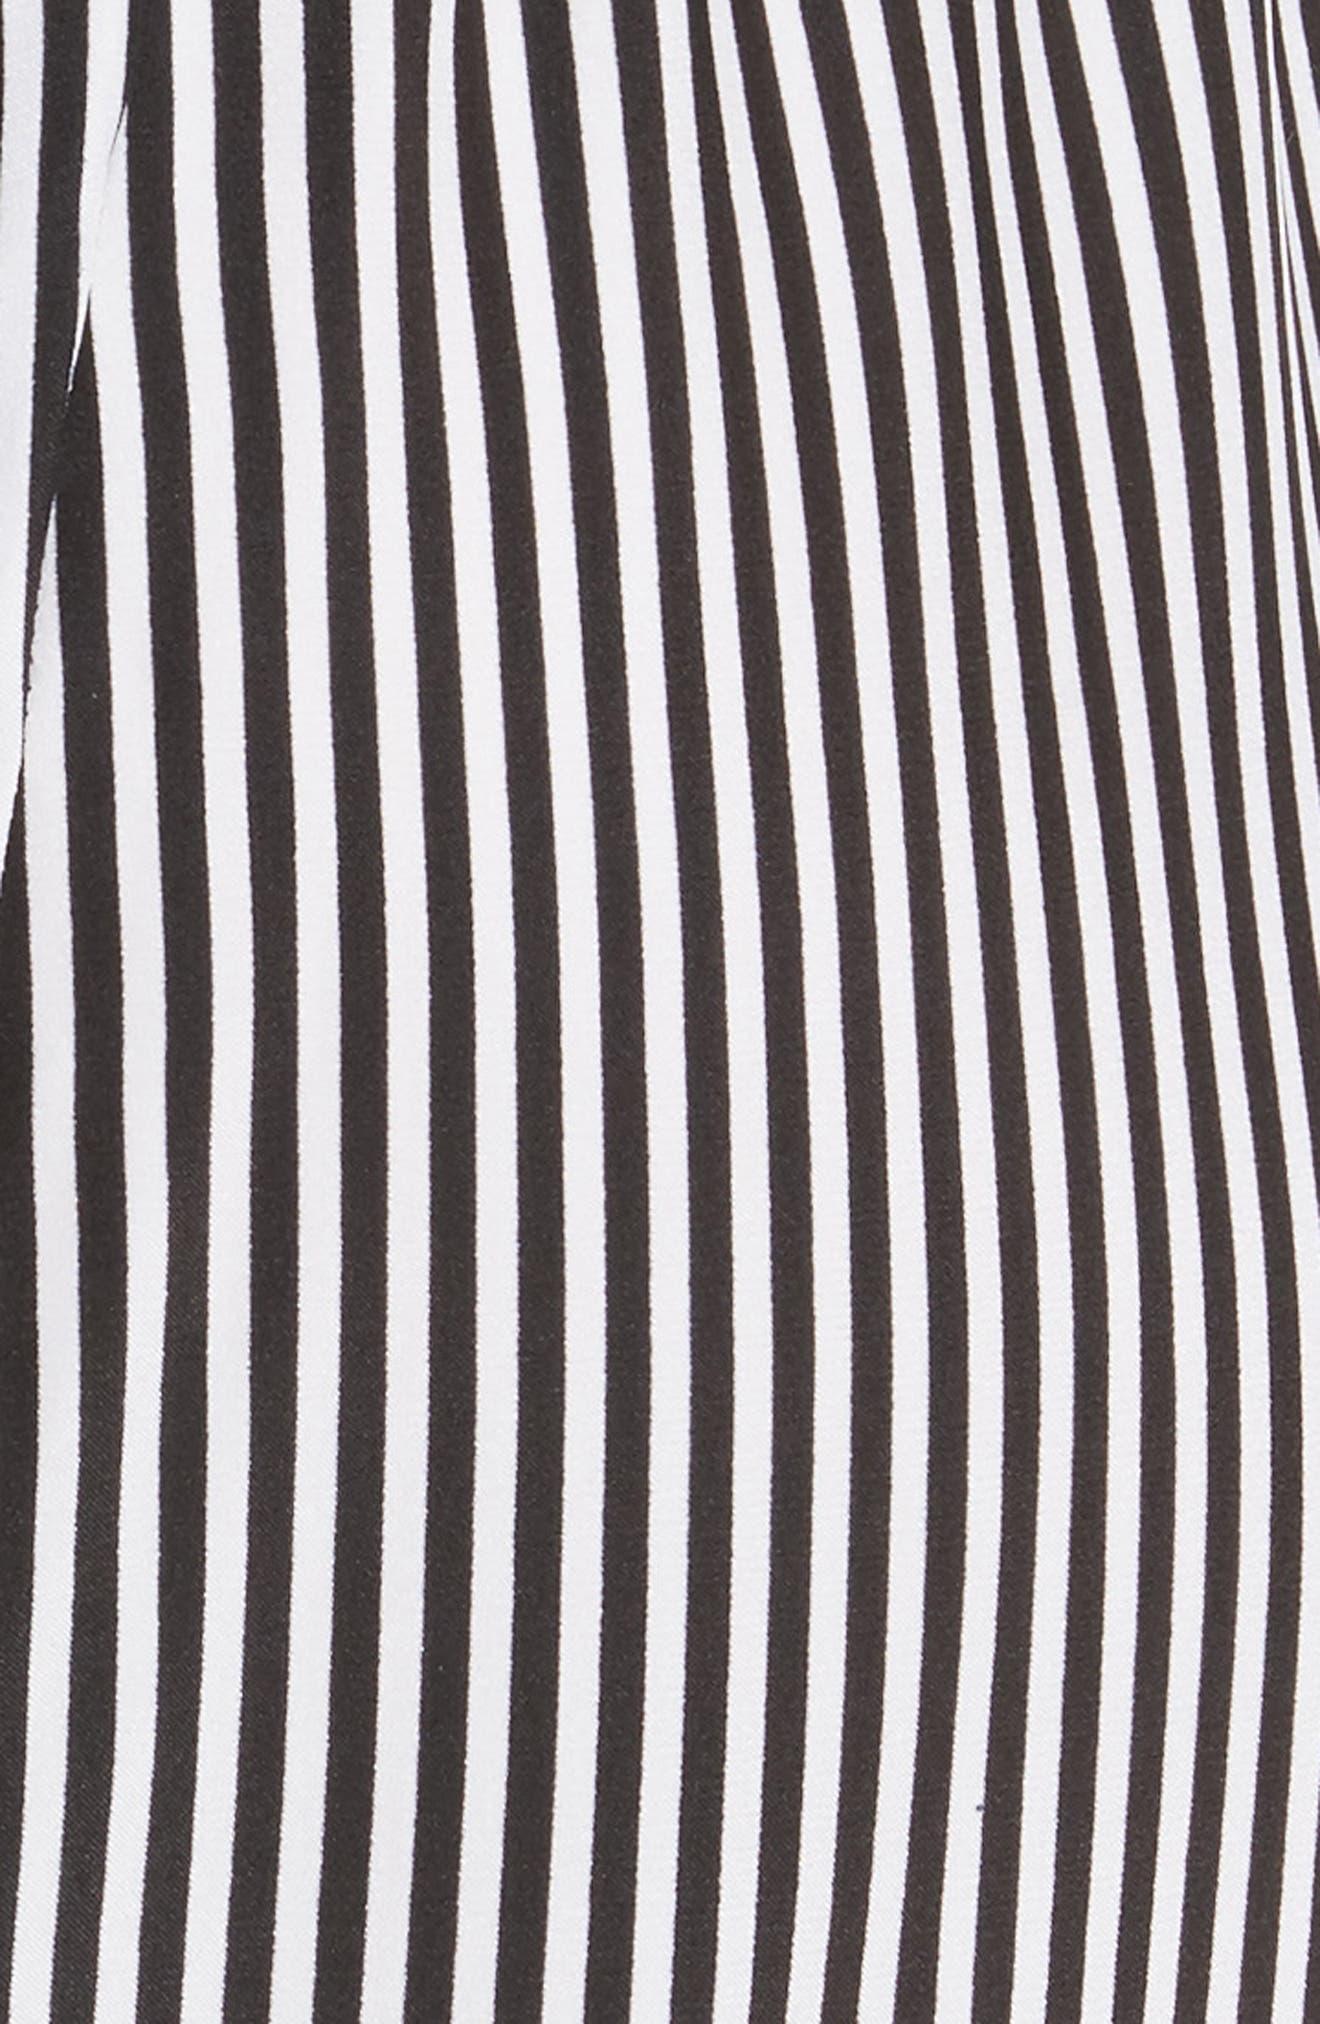 Pencil Stripe Silk Pajama Trousers,                             Alternate thumbnail 9, color,                             Pencil Stripe